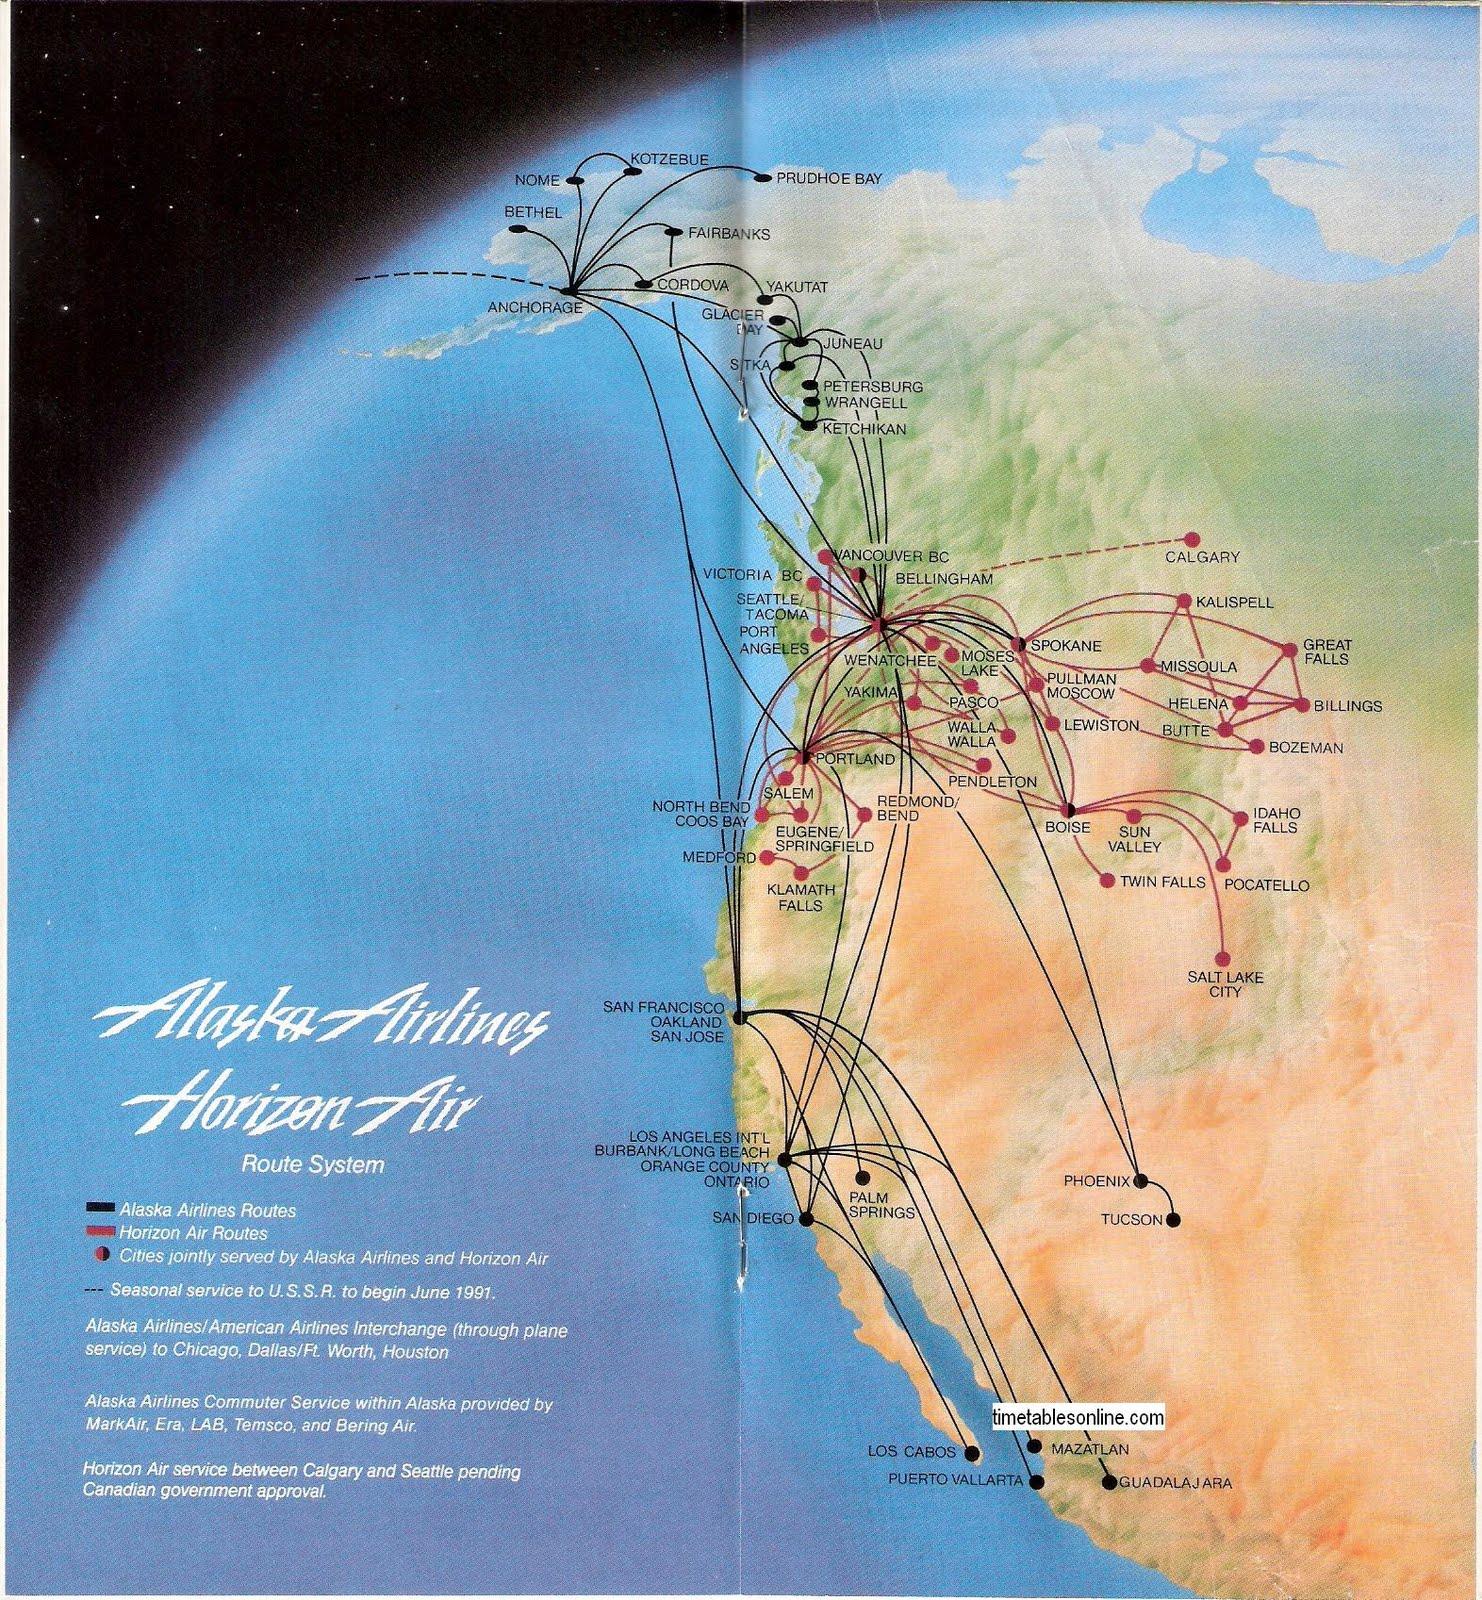 Airline Timetables Alaska Airlines June 1991